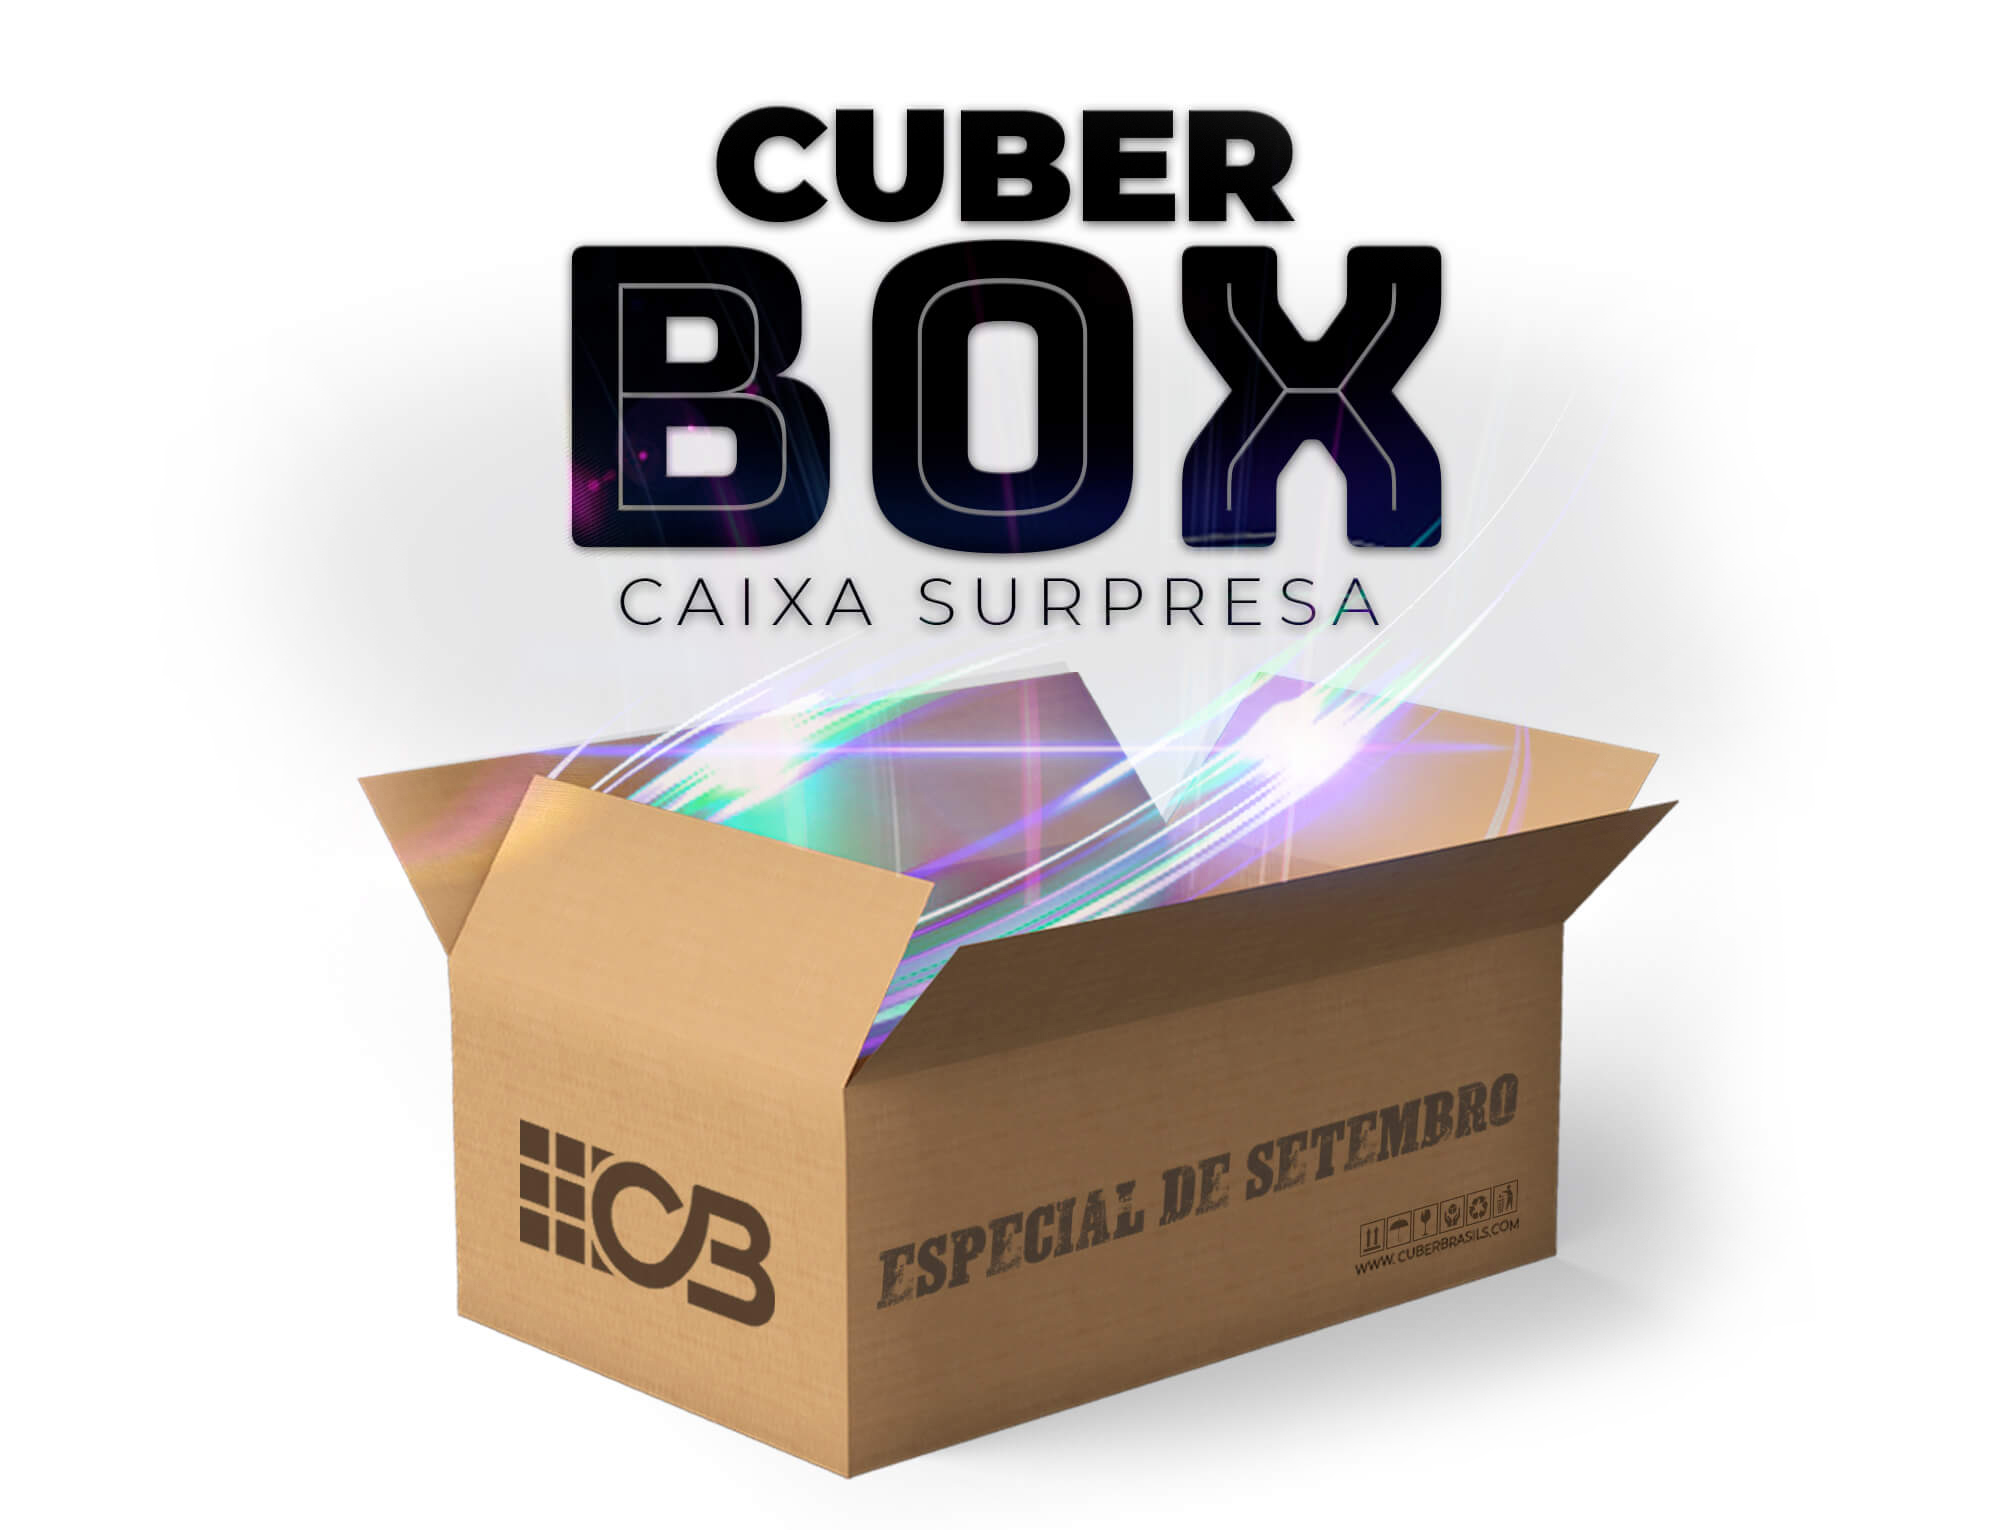 CUBER BOX - CAIXA SURPRESA SETEMBRO